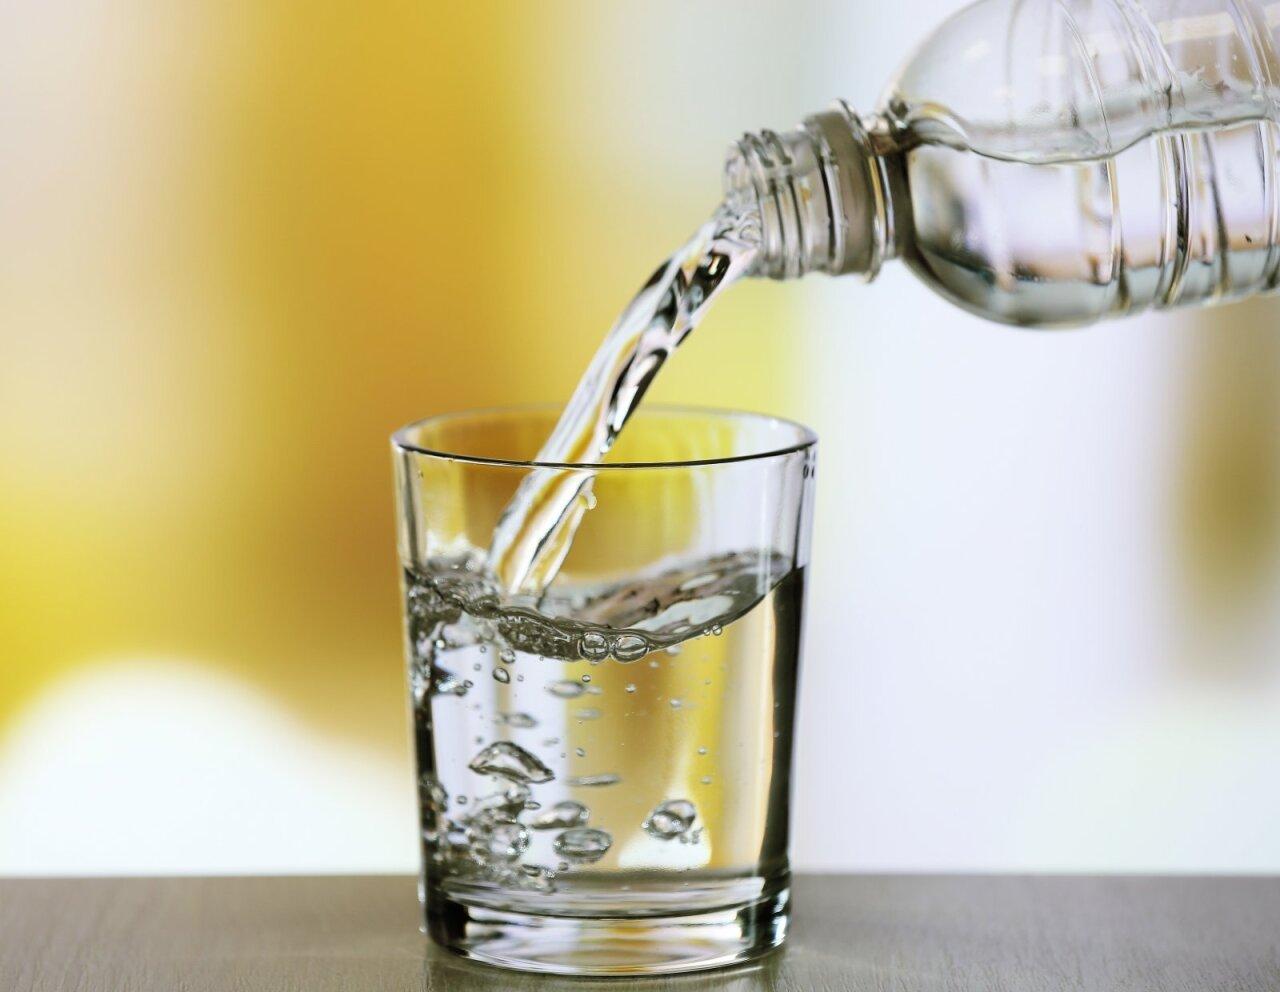 ar man reikia gerti daug vandens su hipertenzija)